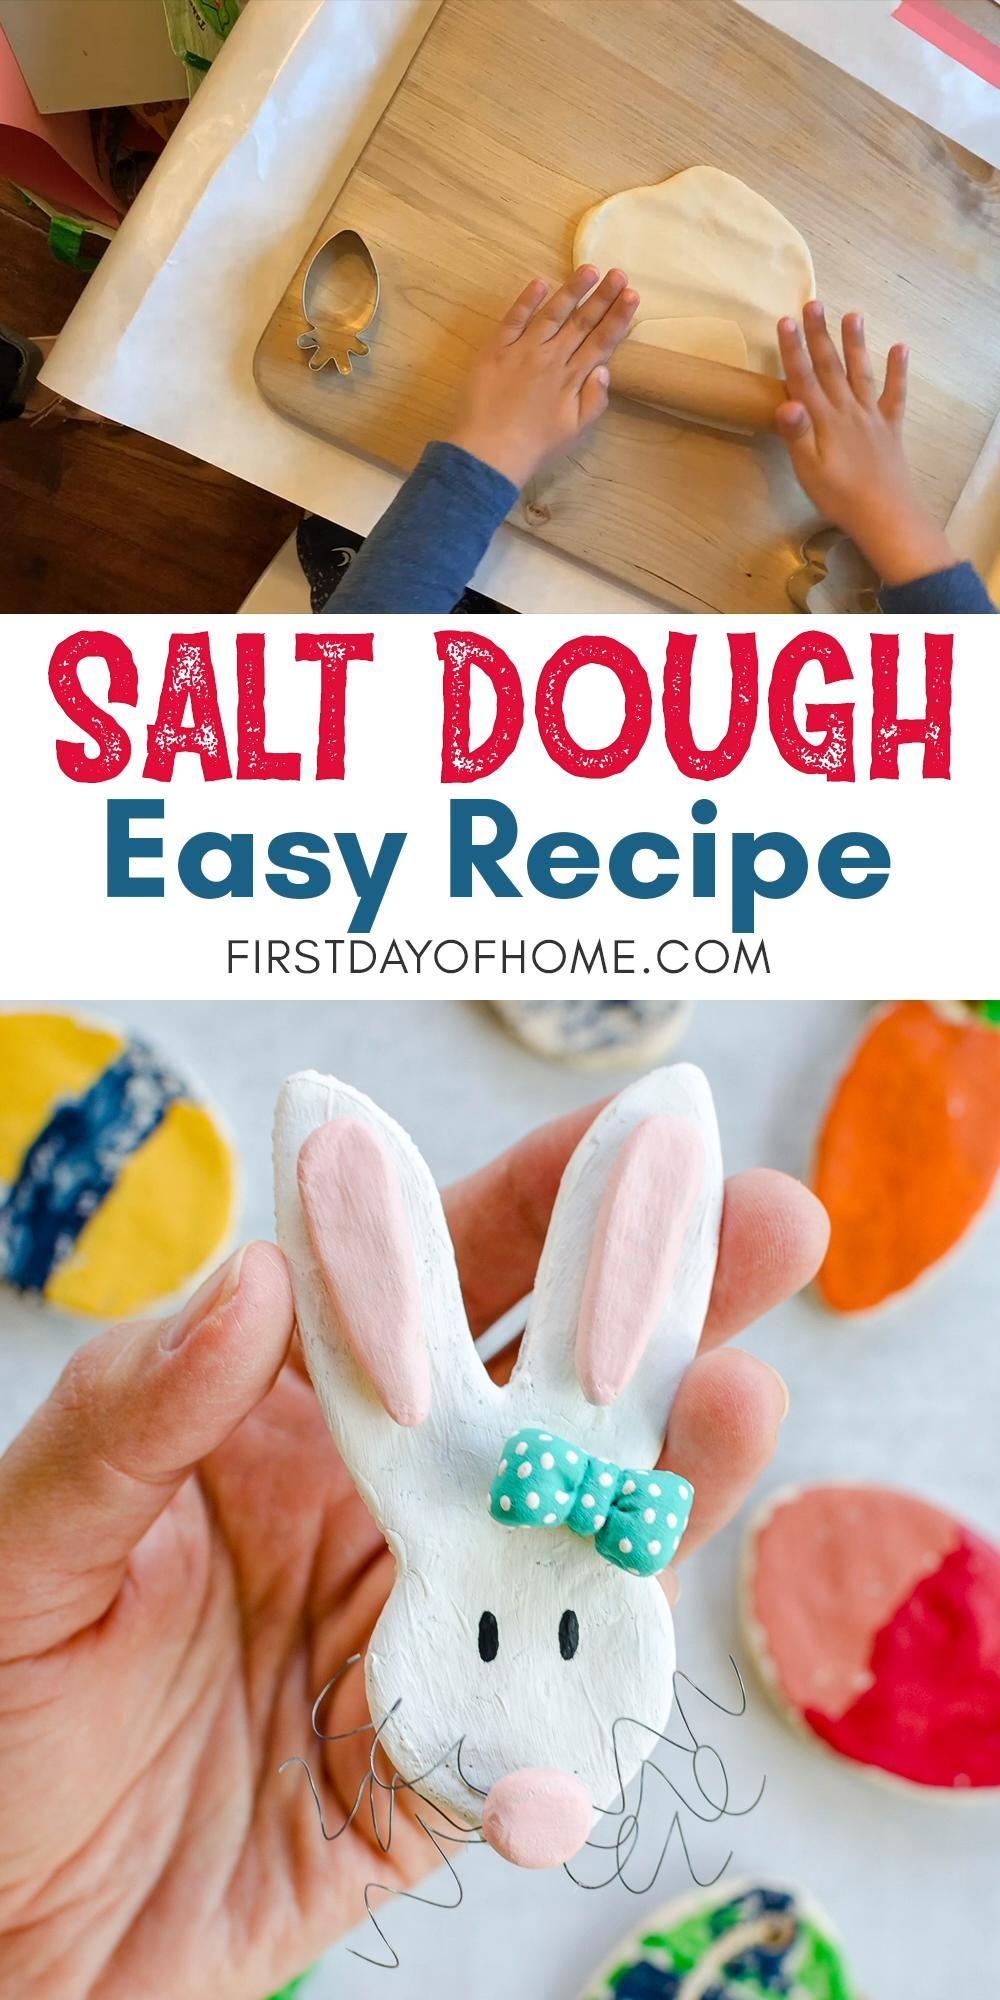 Easiest Salt Dough Recipe Ever!